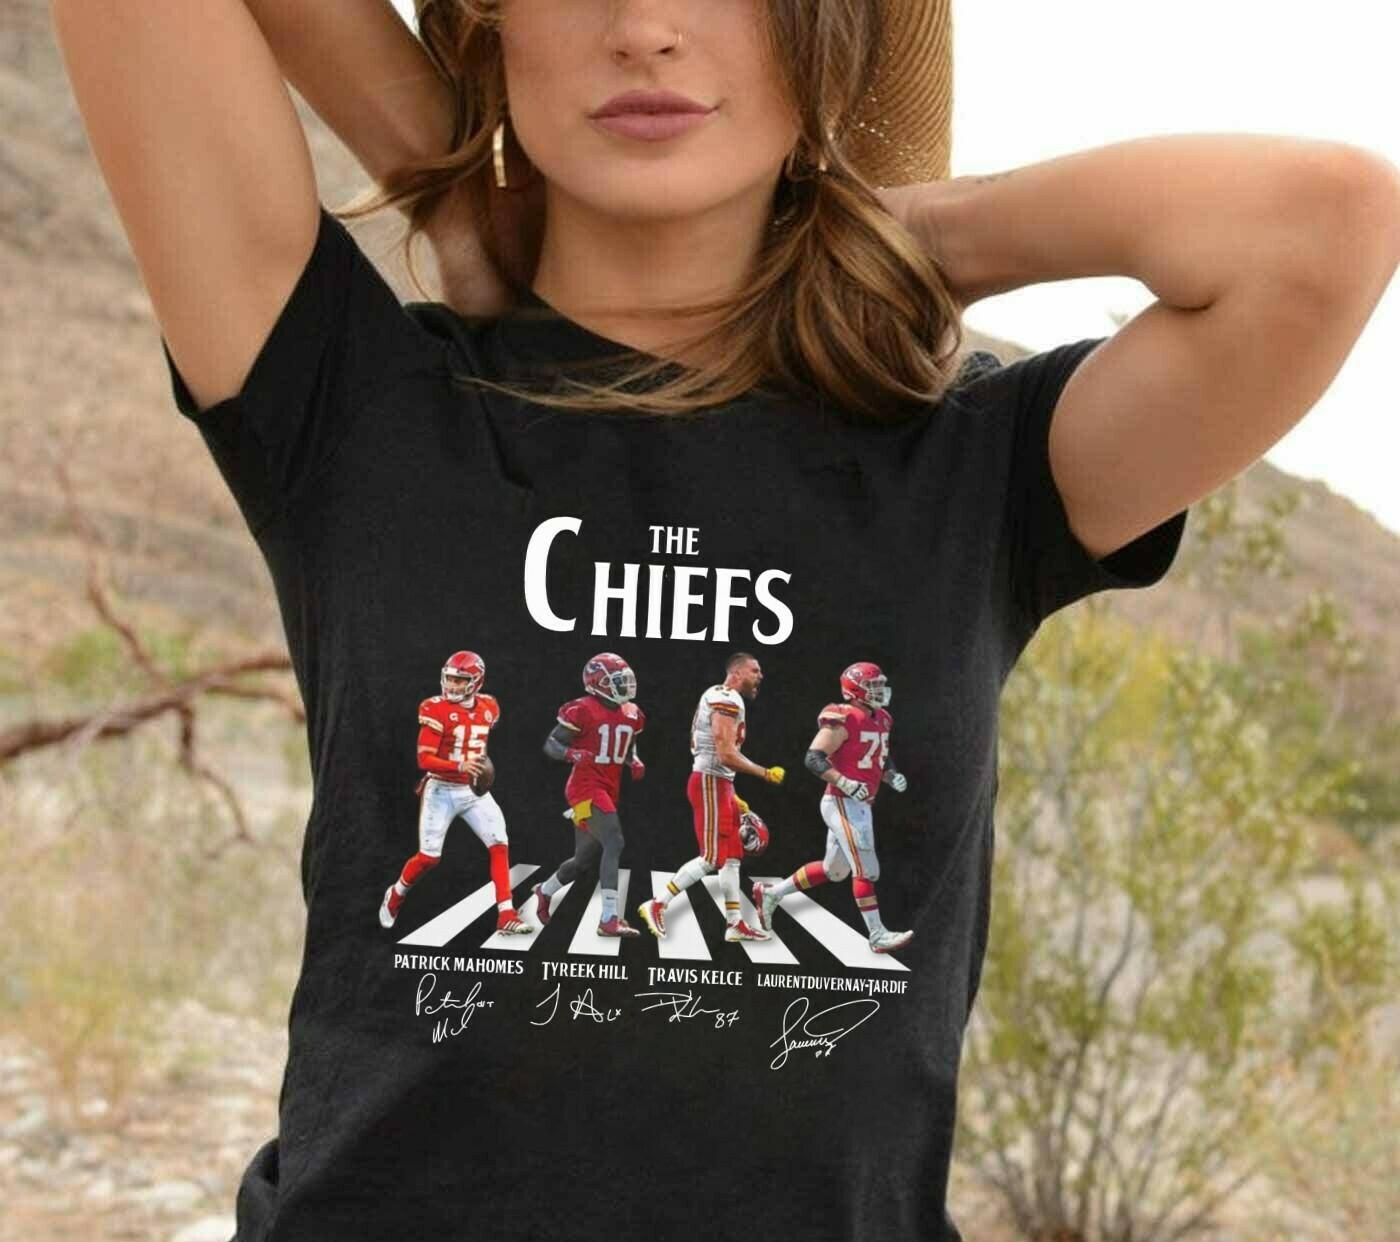 Kansas City Chiefs Super Bowl 54 2020 LIV Champions February 2 2020 Mahomes NFL Football Team Dad Mon Kid Fan Gift T-Shirt Long Sleeve Sweatshirt Hoodie Jolly Family Gifts